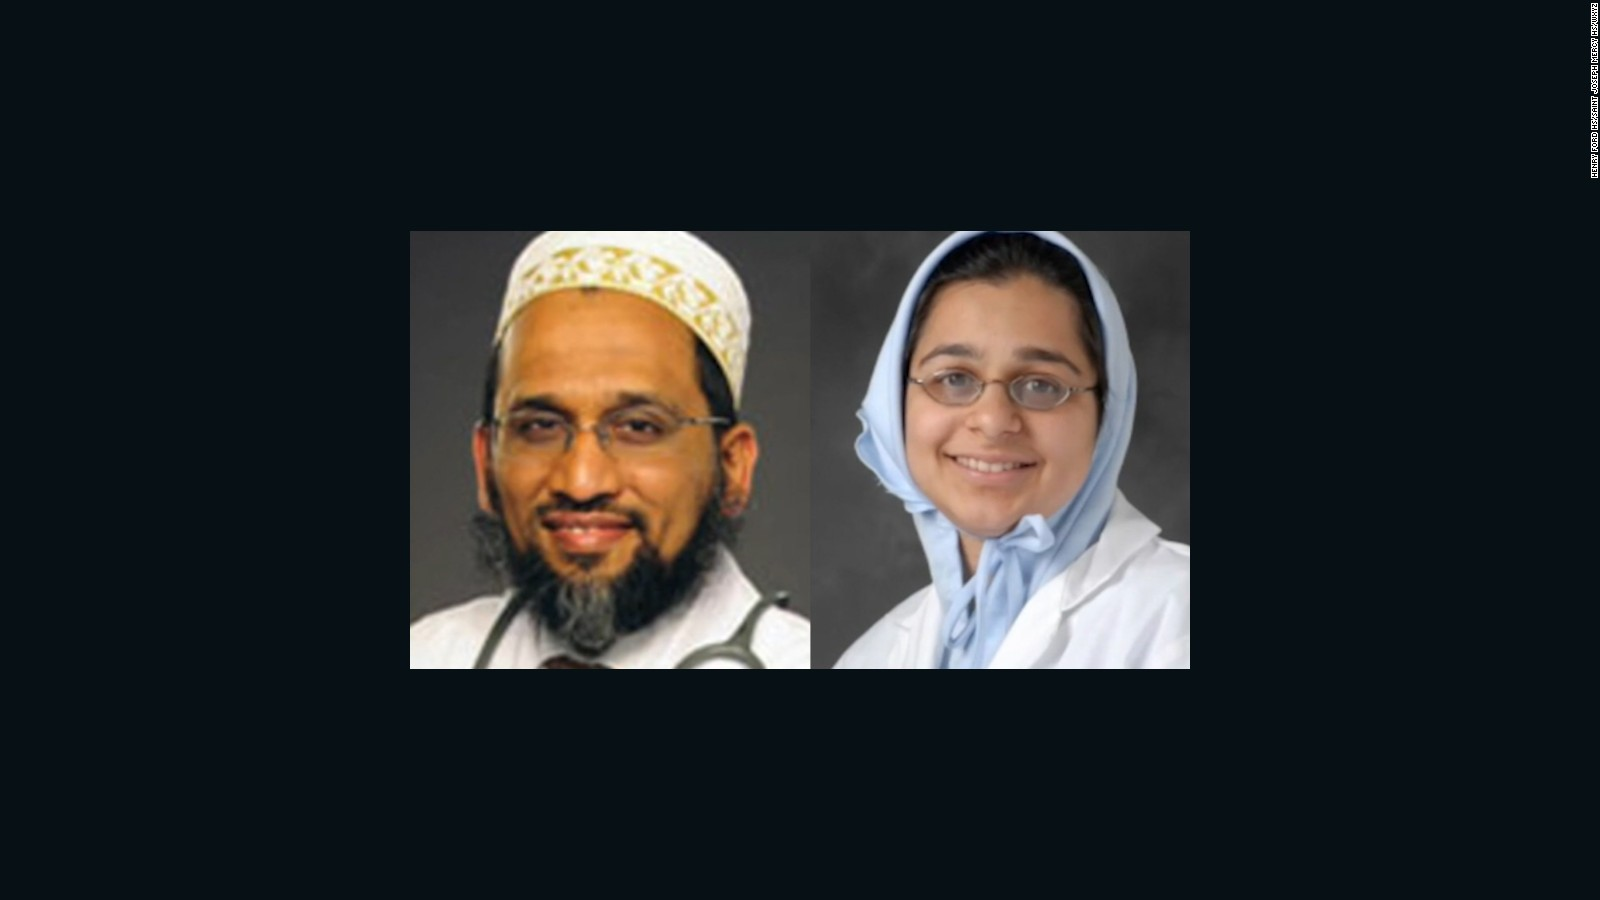 Michigan doctors charged in genital mutilation case - CNN